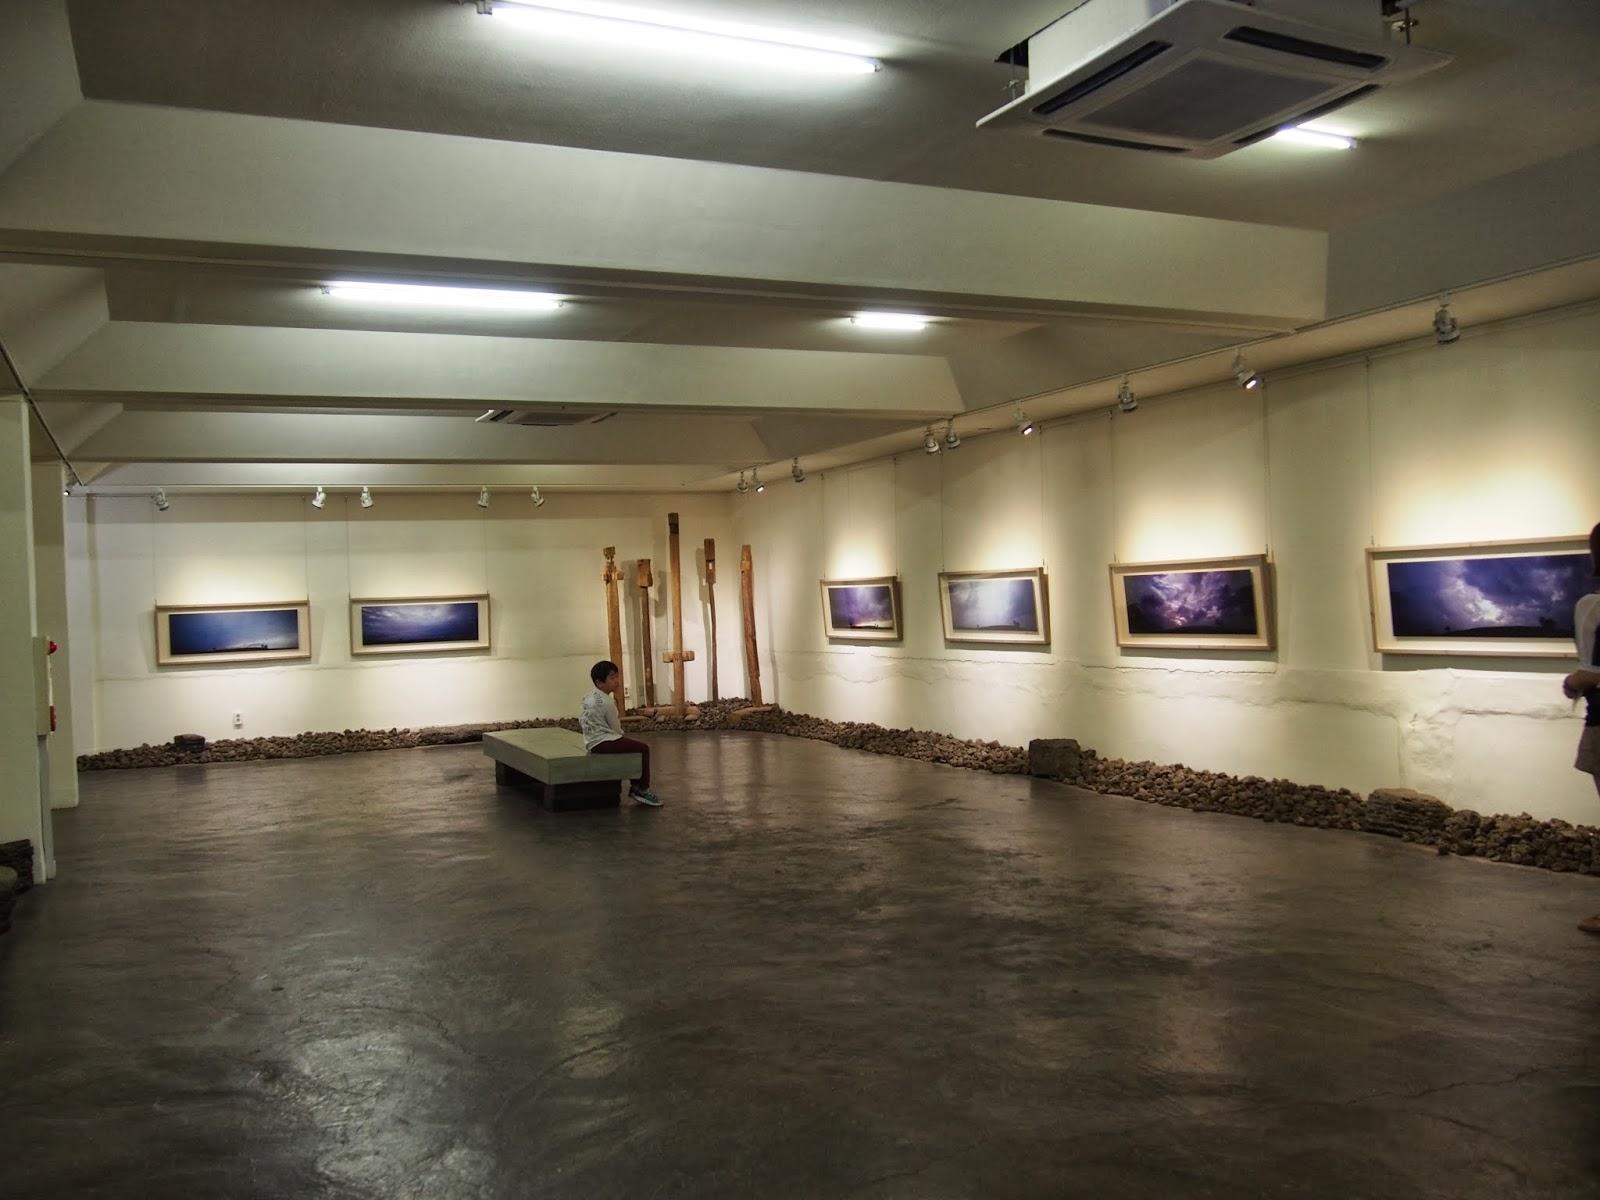 23 Kim Young Gap Gallery